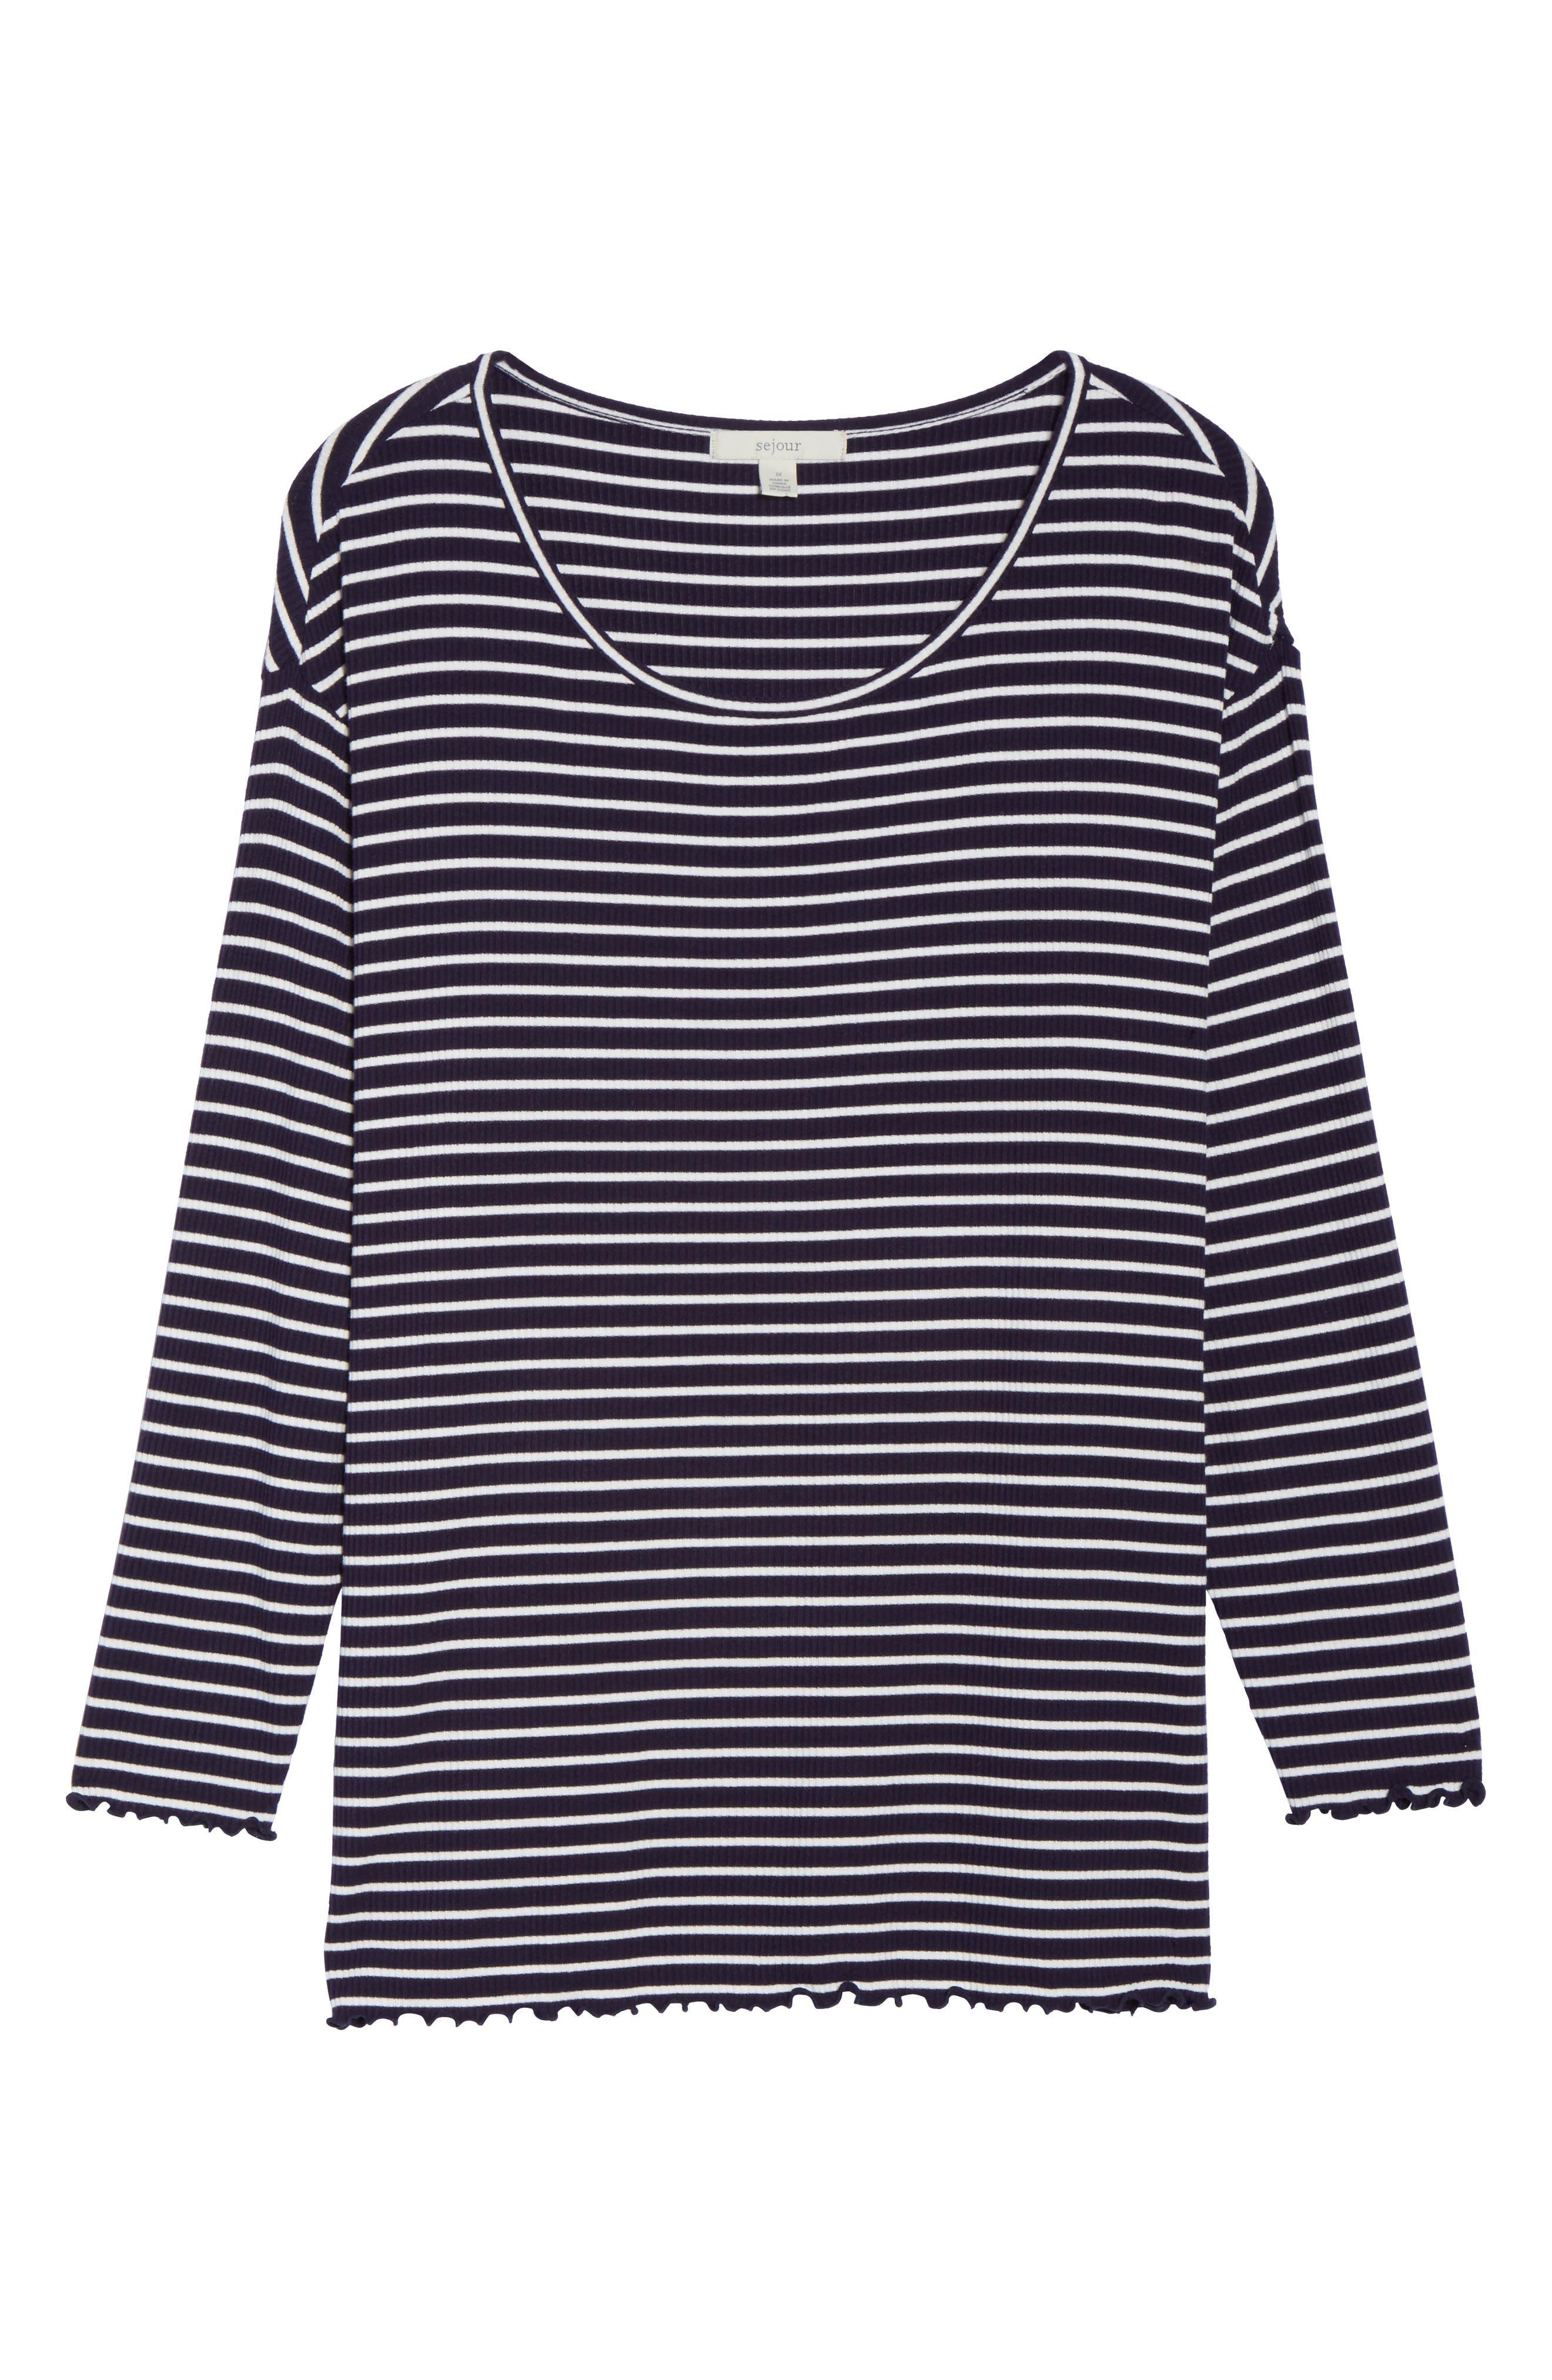 Scoop Neck Long Sleeve Tee,                             Alternate thumbnail 6, color,                             Navy- White Stripe